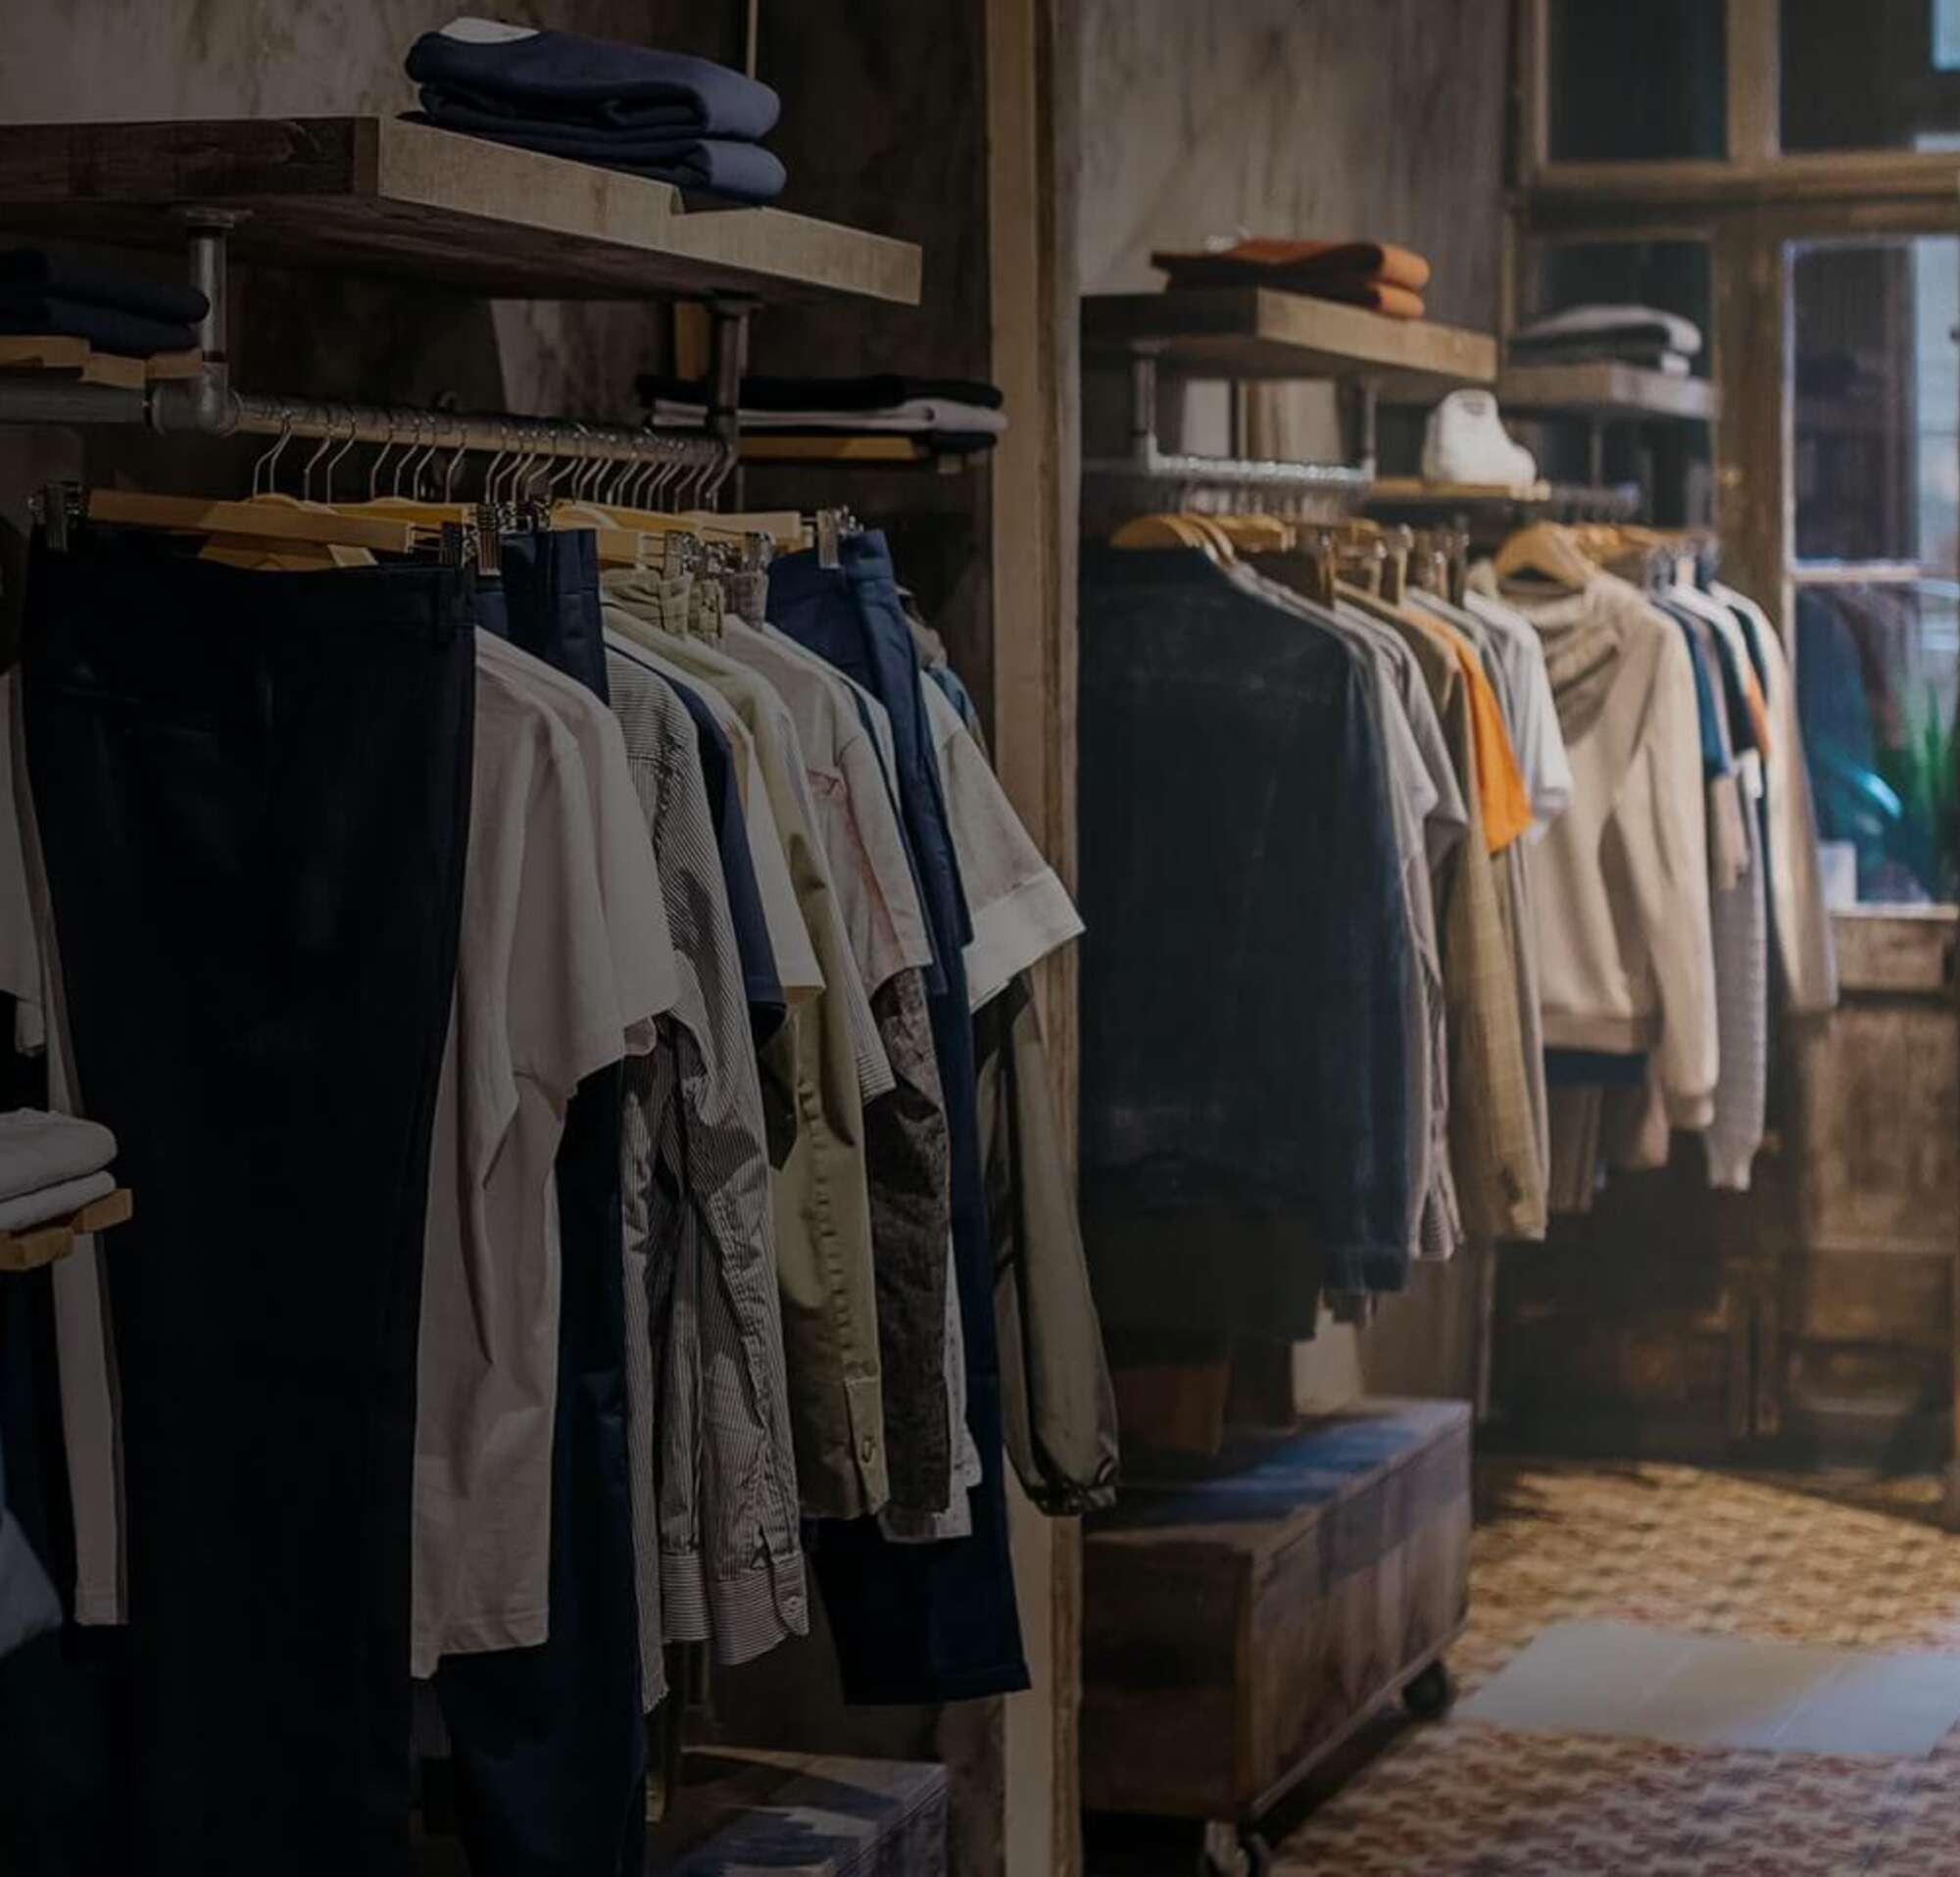 A clothing rack inside a shop.